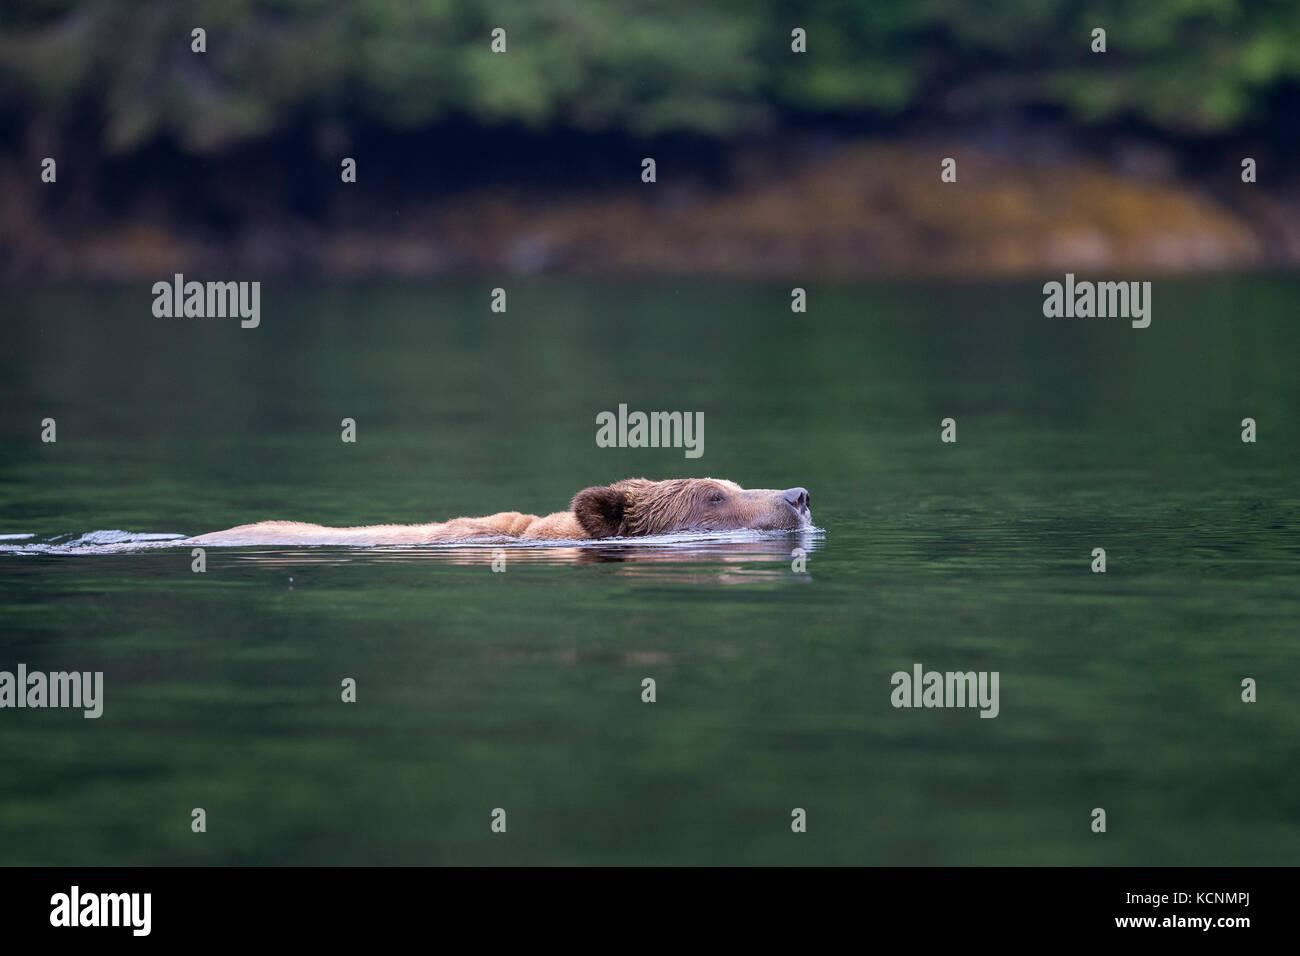 Grizzly bear (Ursus arctos horribilis), large male, swimming, Khutzeymateen Inlet, Khutzeymateen Grizzly Bear Sanctuary, - Stock Image